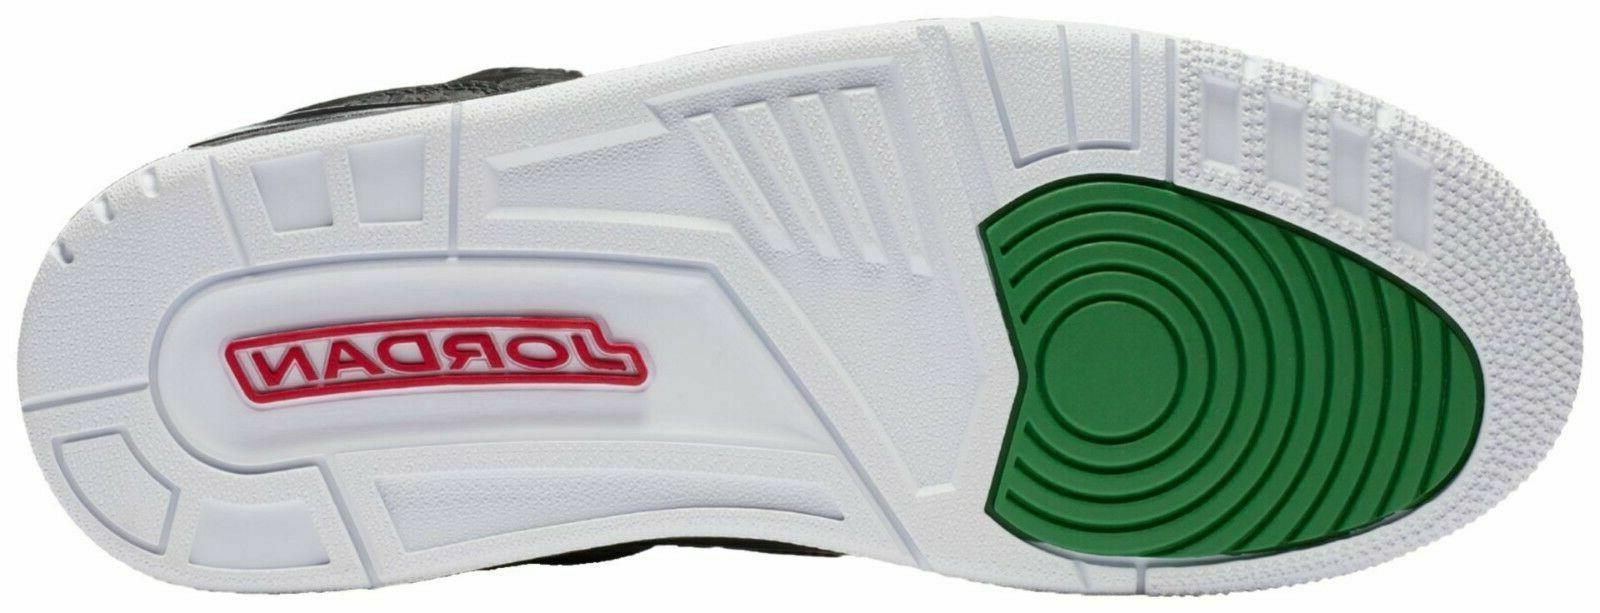 Nike Air Basketball Black Green